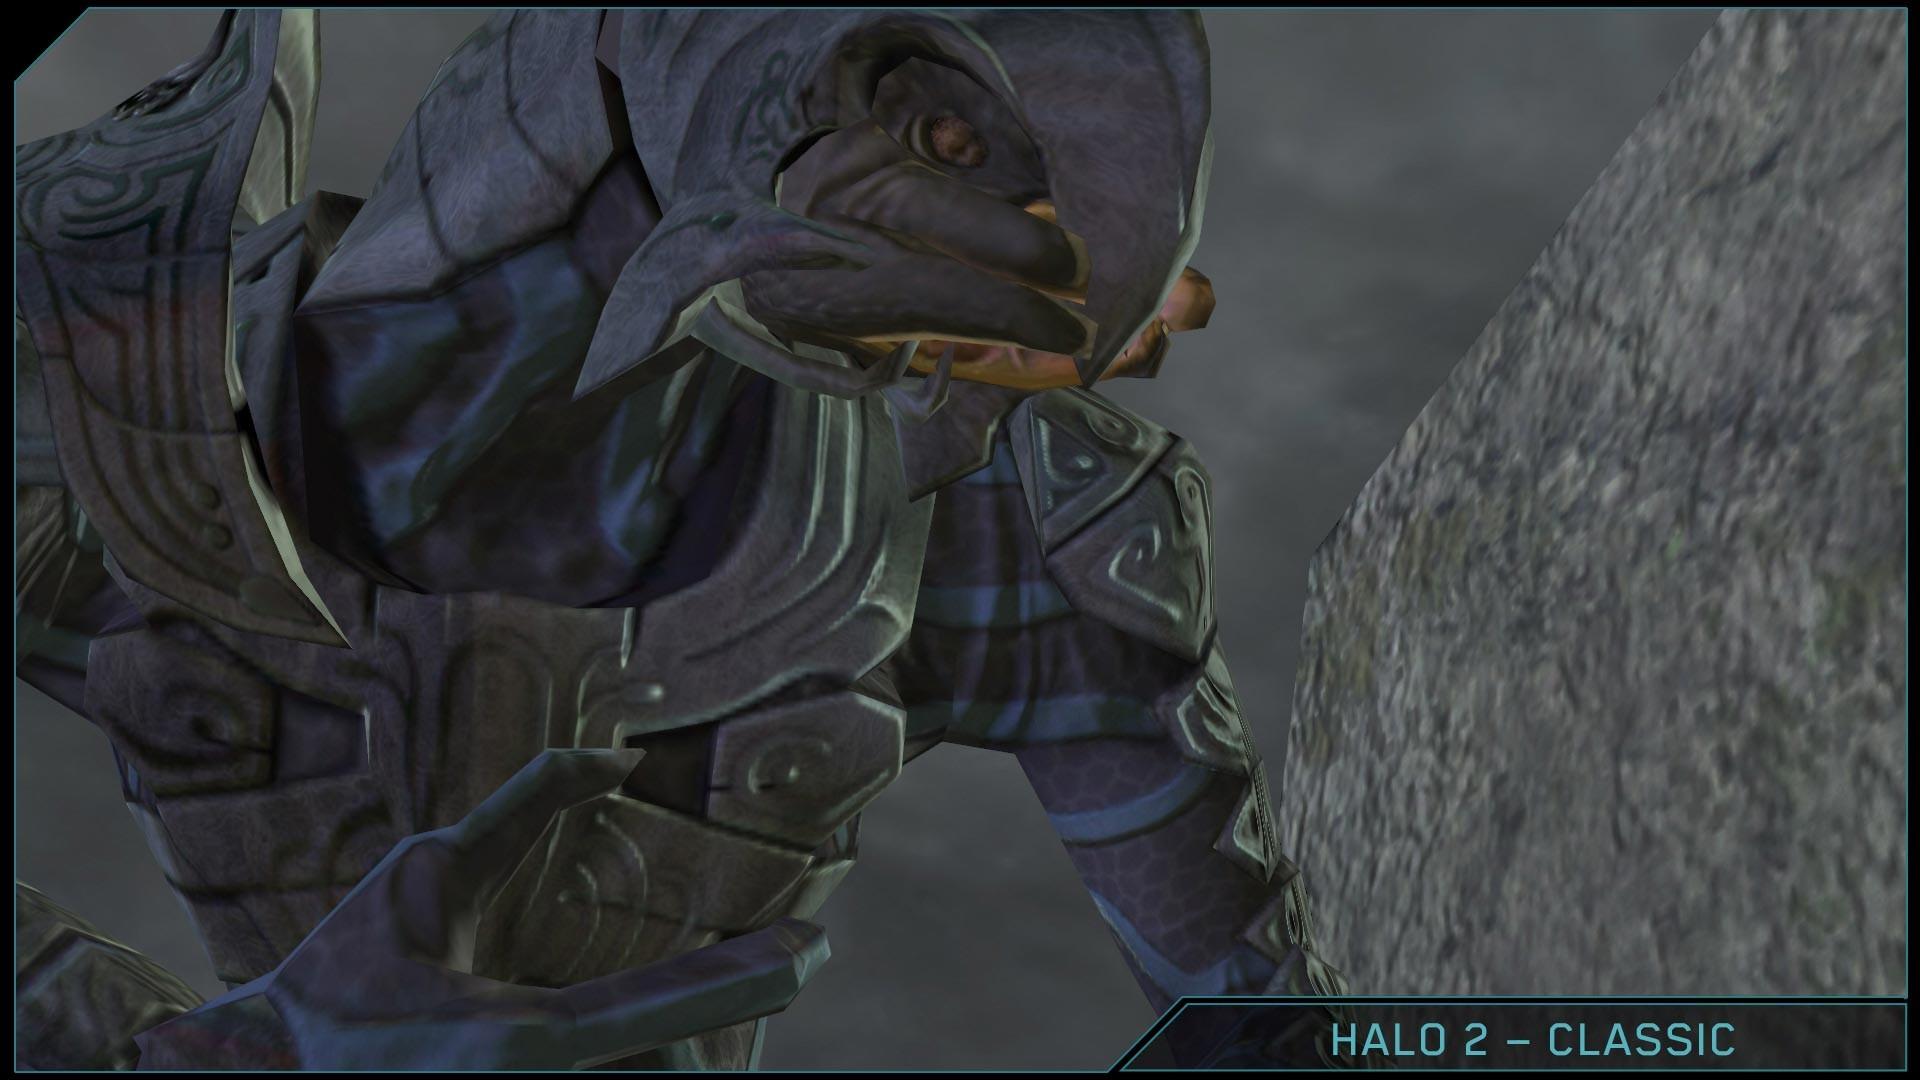 Halo 2 CG Cutscenes